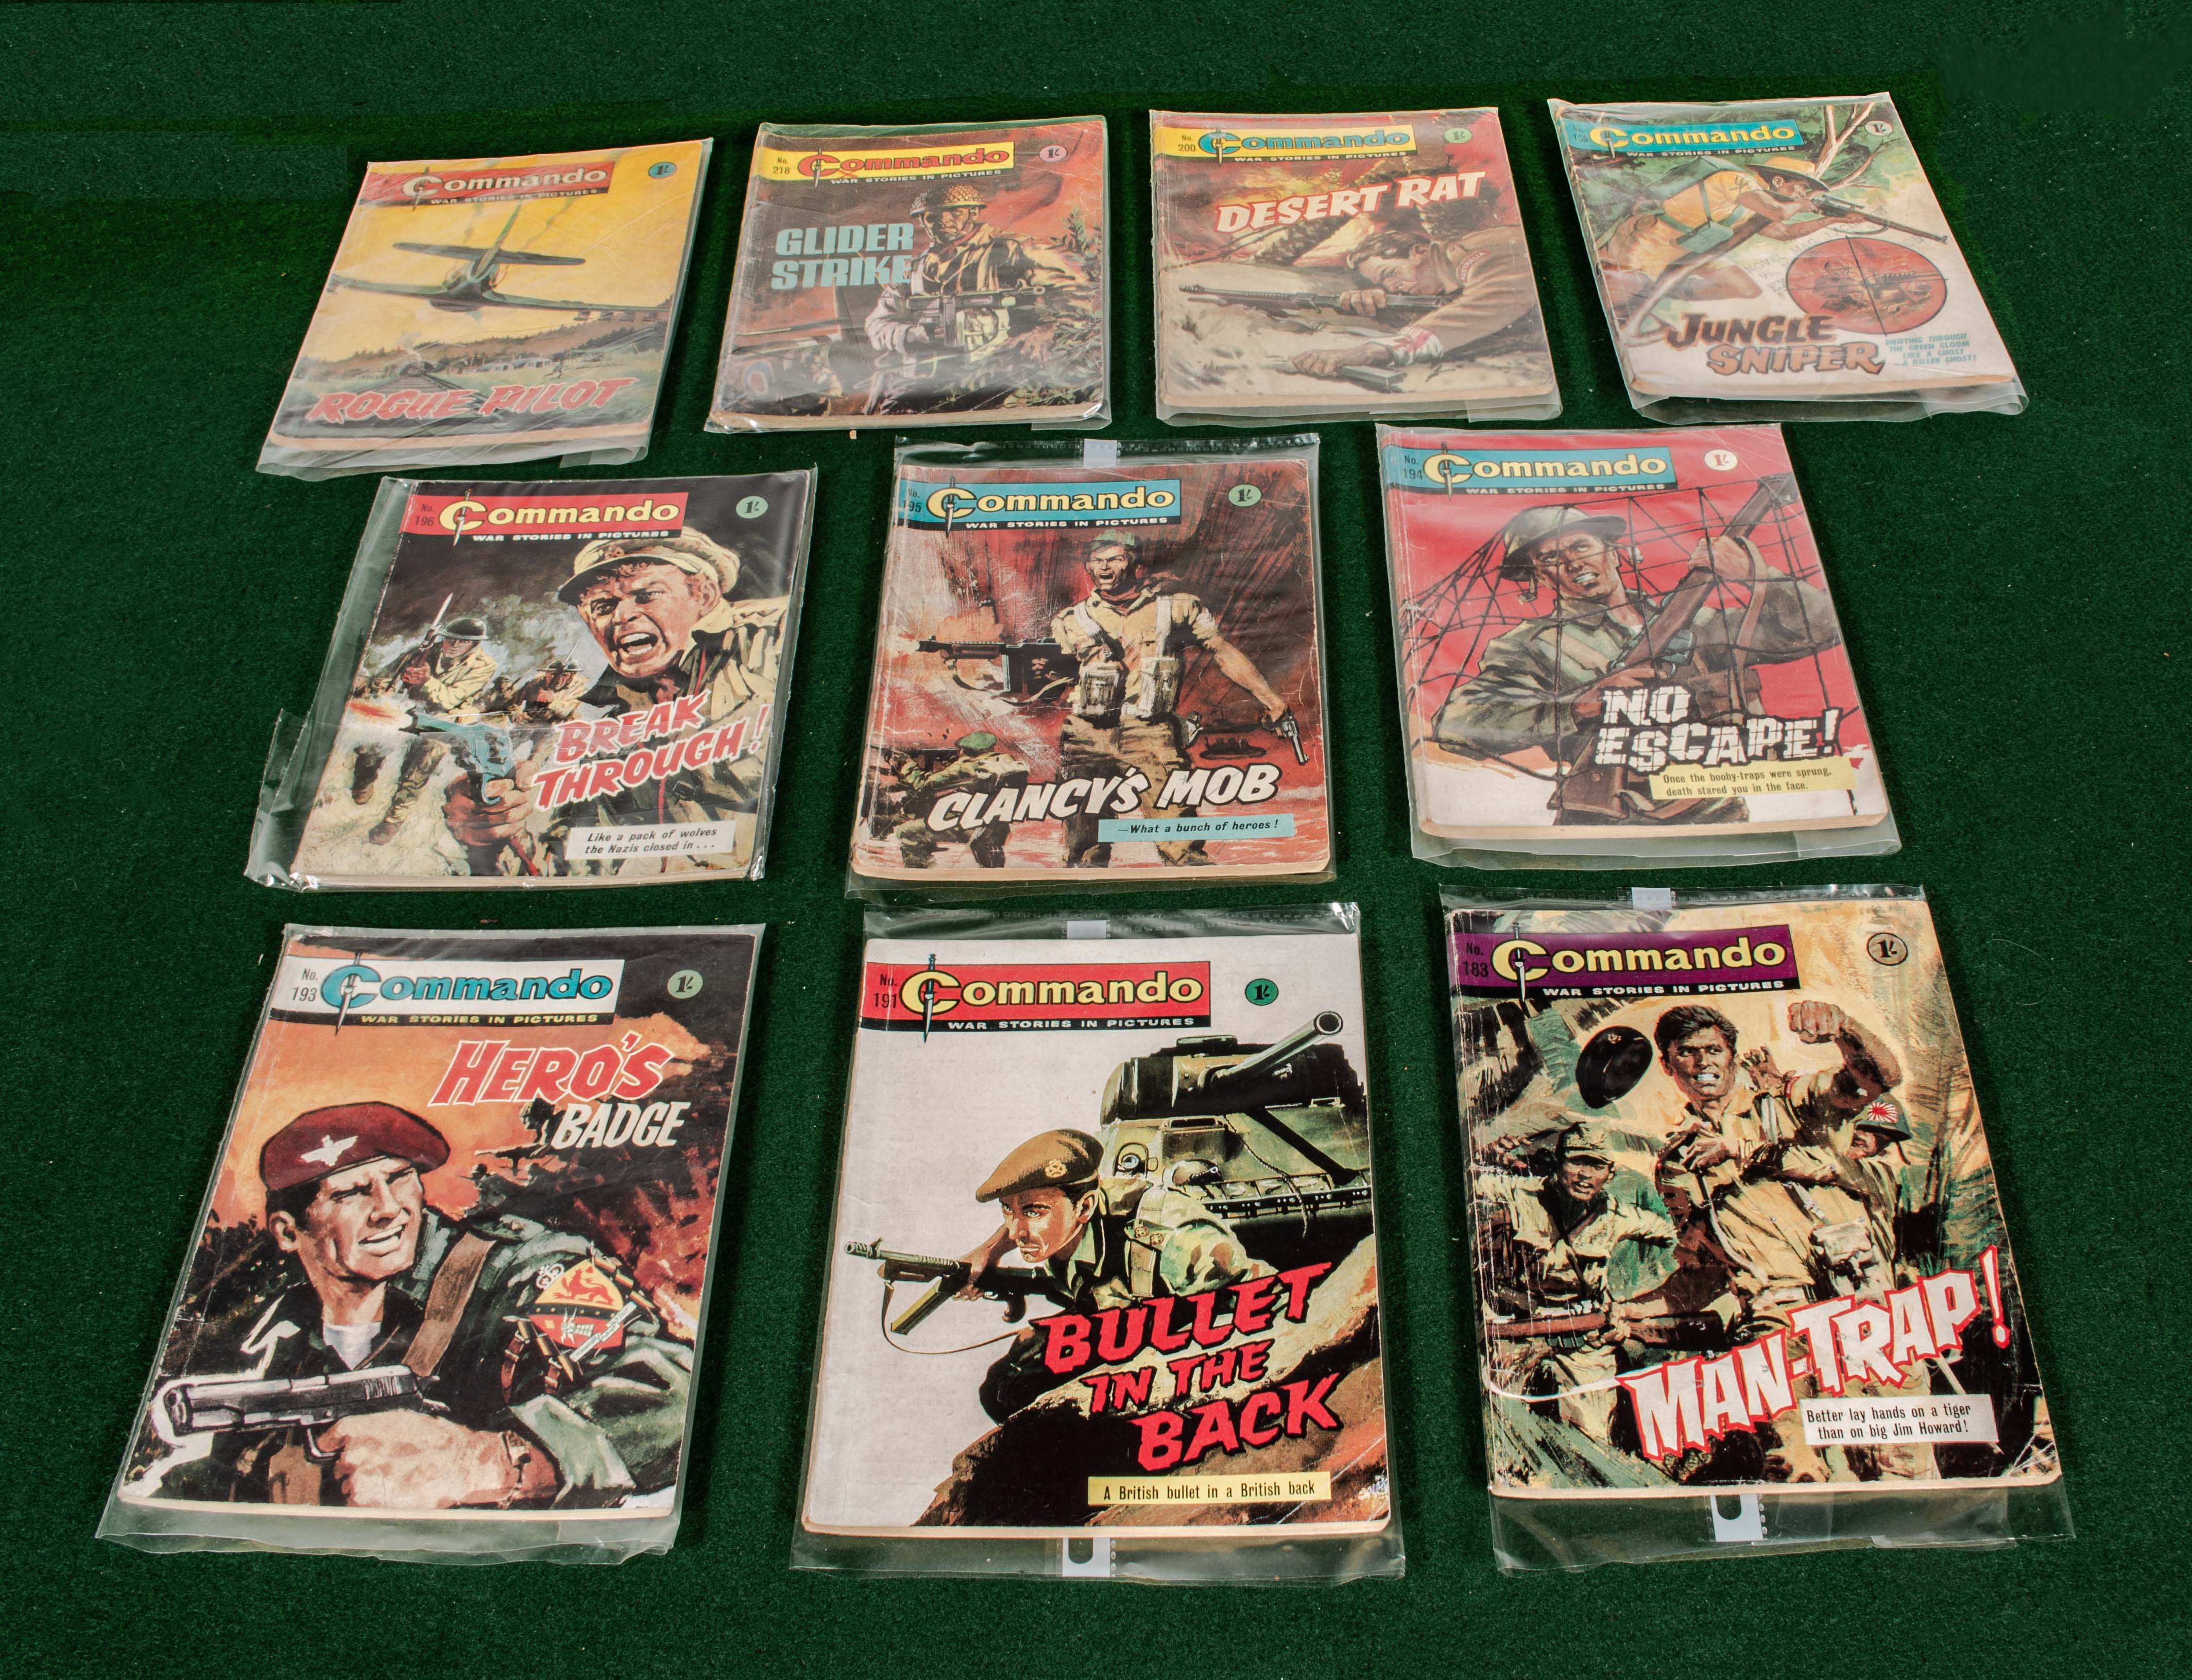 Lot 84 - 10 early 1960s Commando comics 155, 183, 191, 193, 194, 195, 196, 200, 218, 219